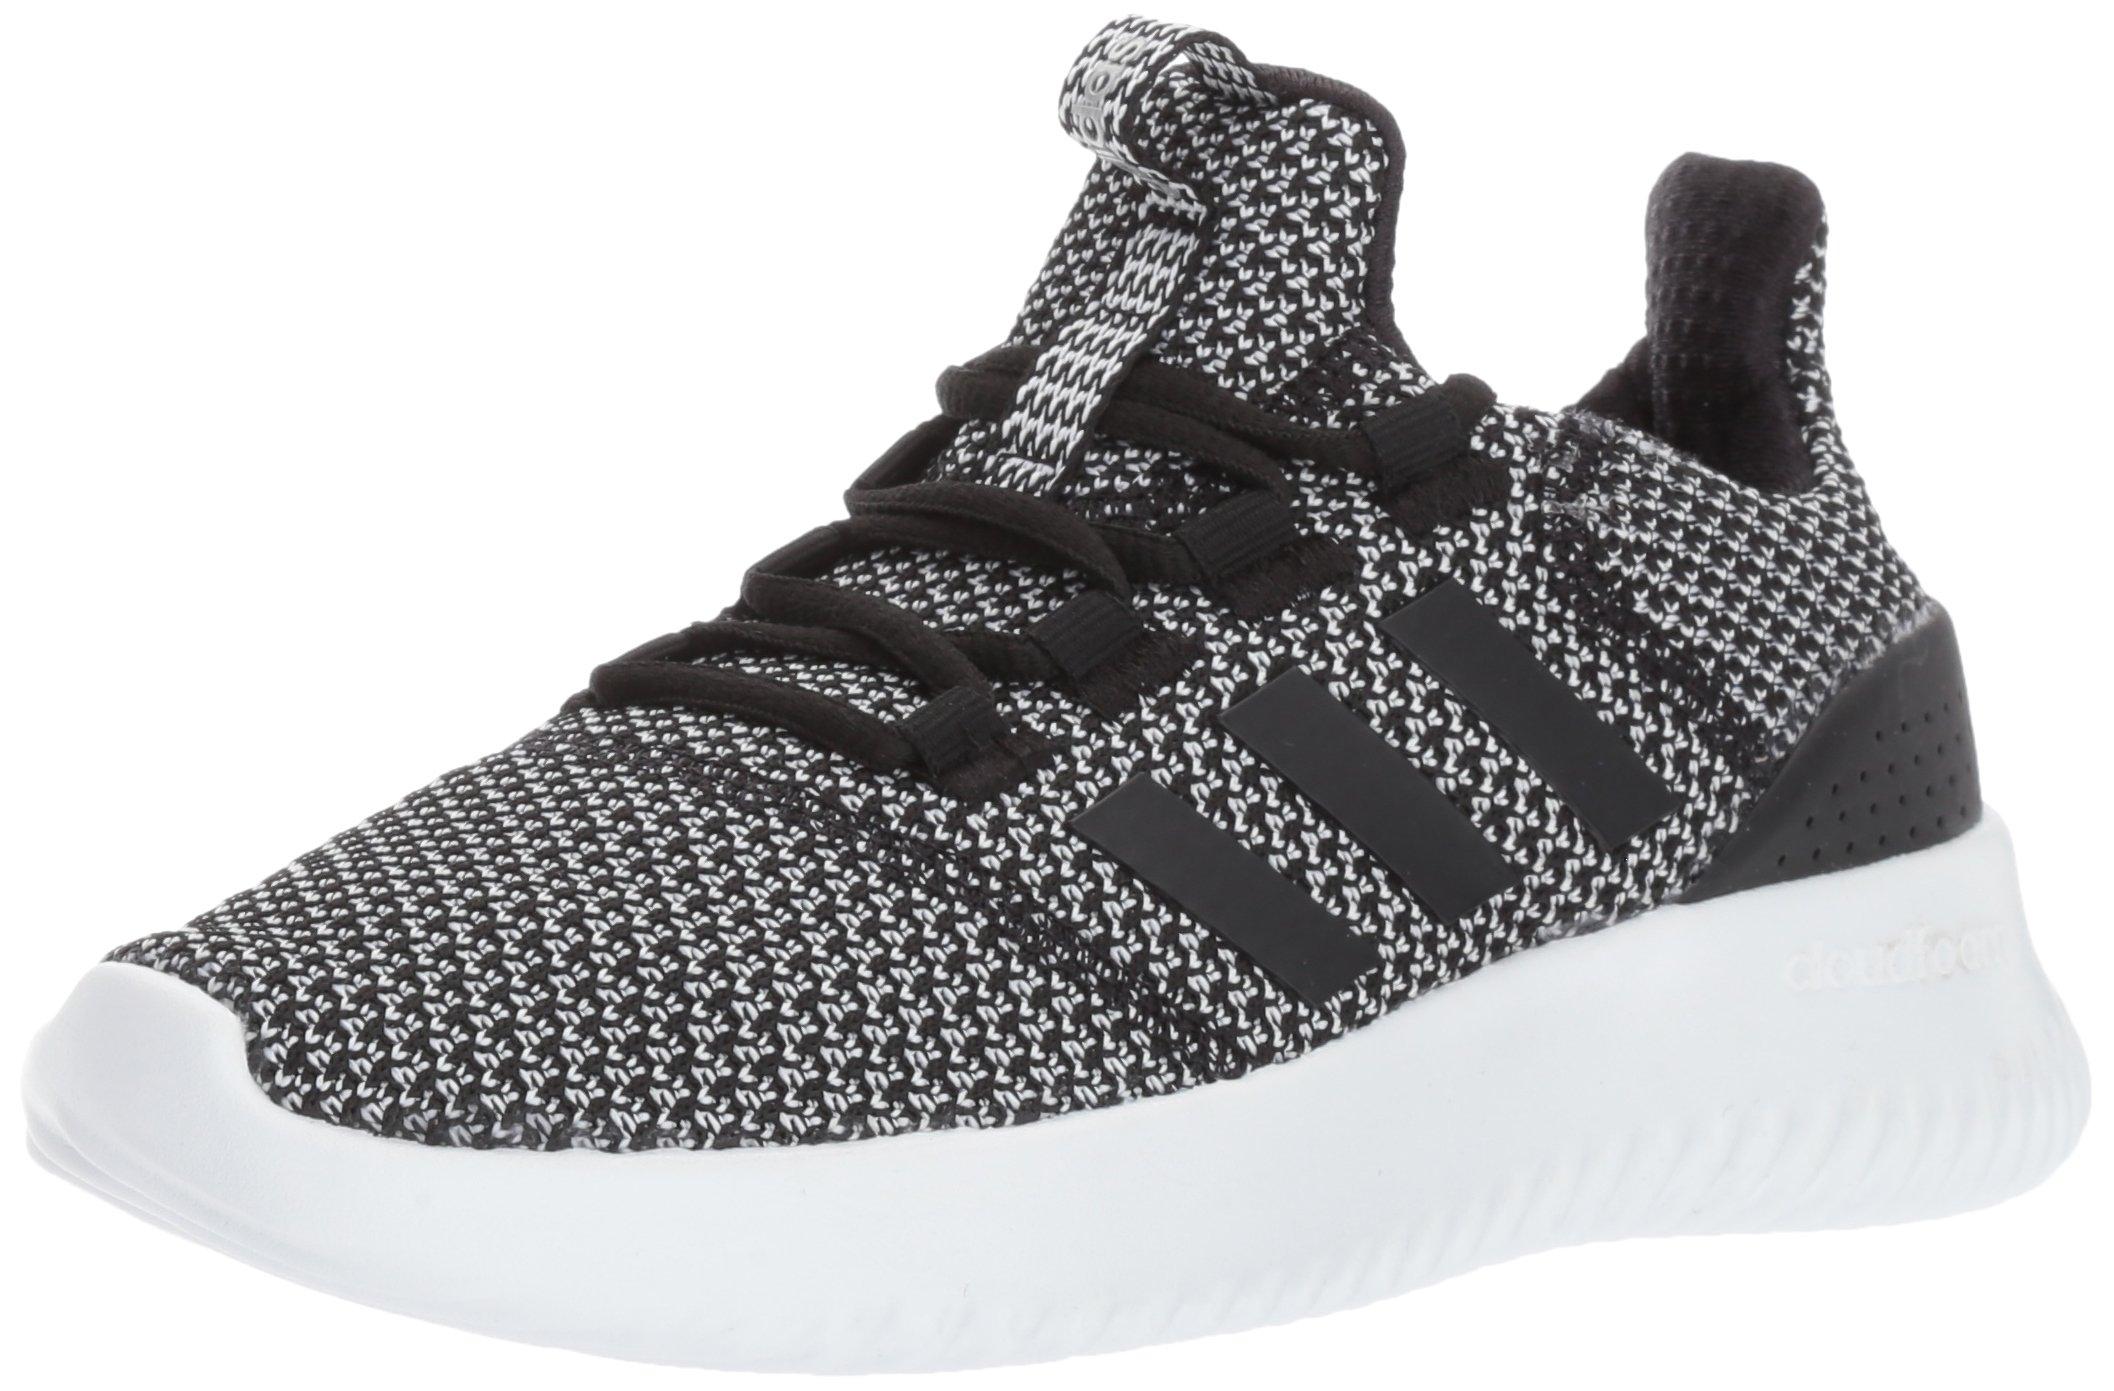 adidas Kids' Cloudfoam Ultimate Sneaker, Black/Black/Metallic Silver, 3 M US Little Kid